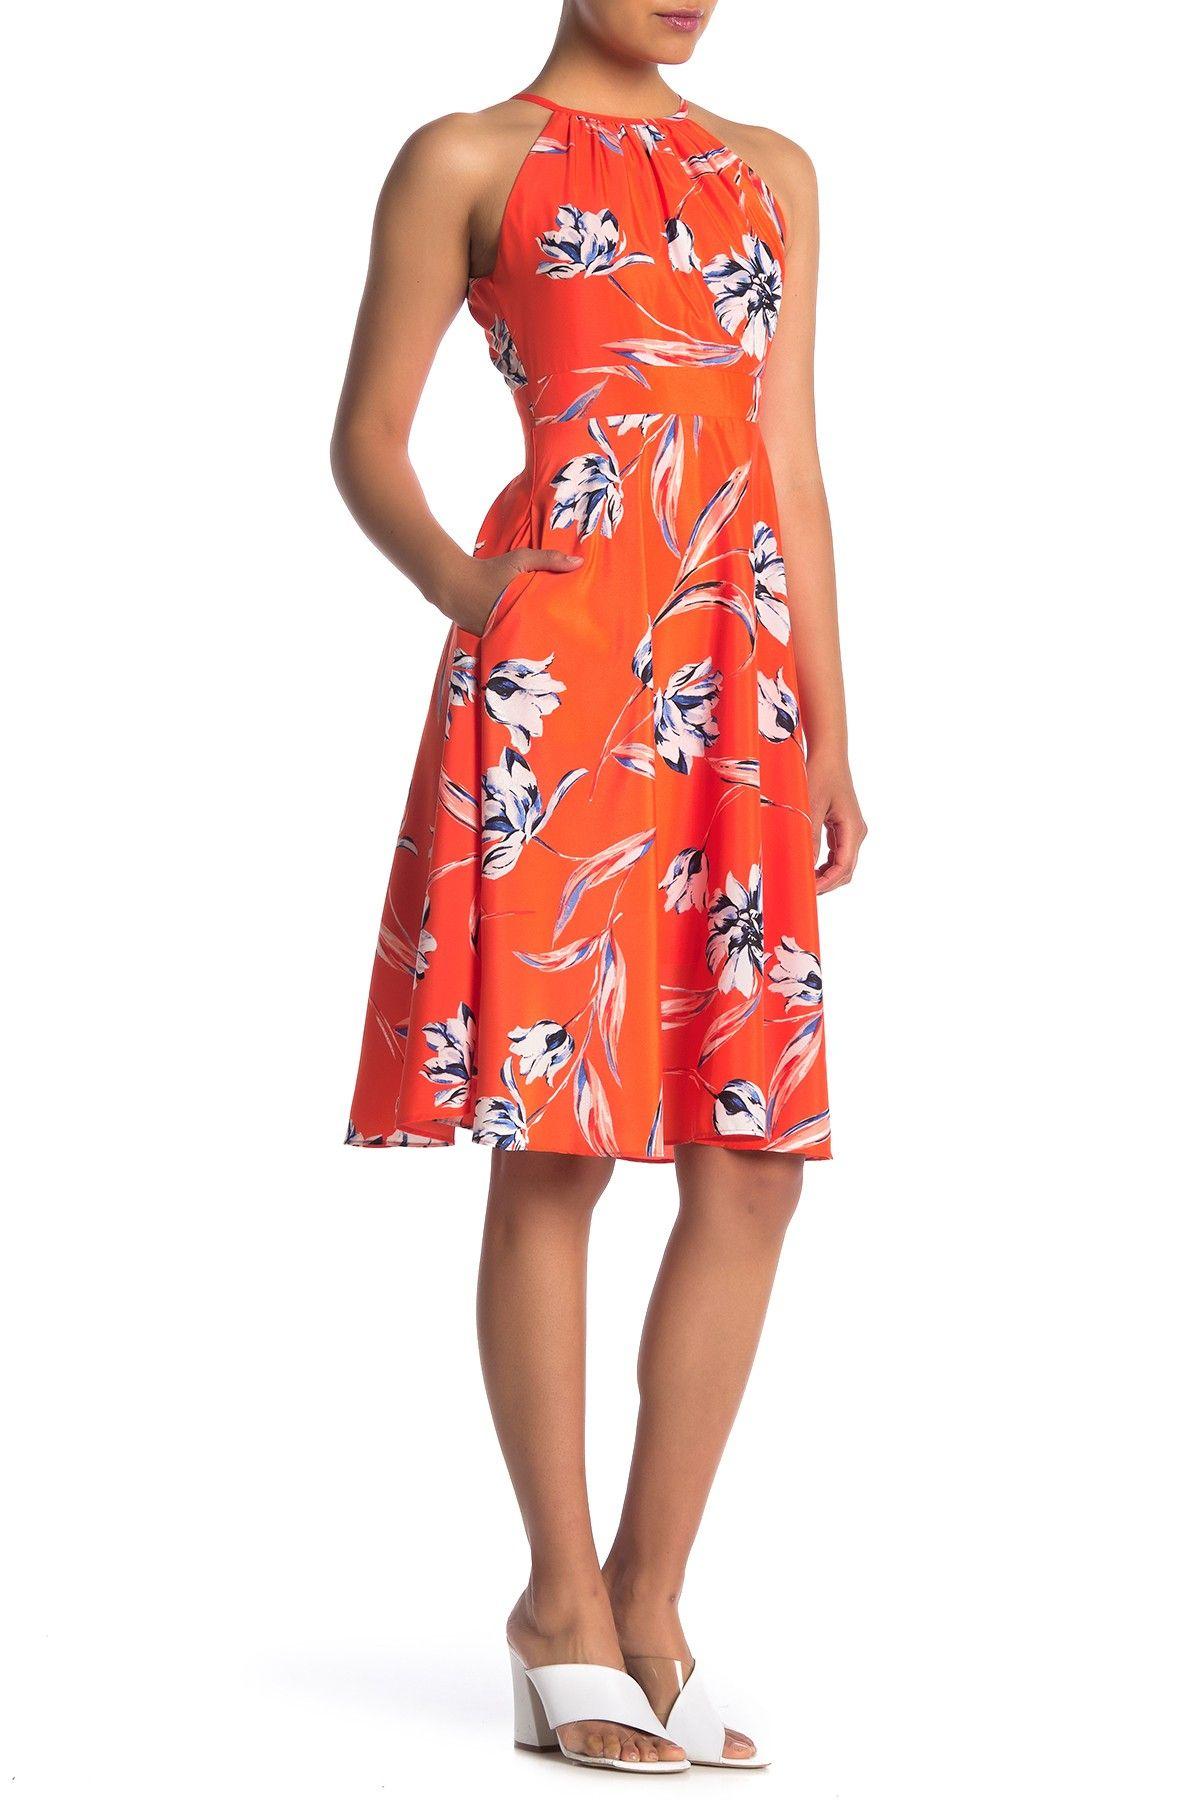 Eliza J Floral Halter Midi Dress Nordstrom Rack Petite Midi Dress Petite Dresses Halter Midi Dress [ 1800 x 1200 Pixel ]